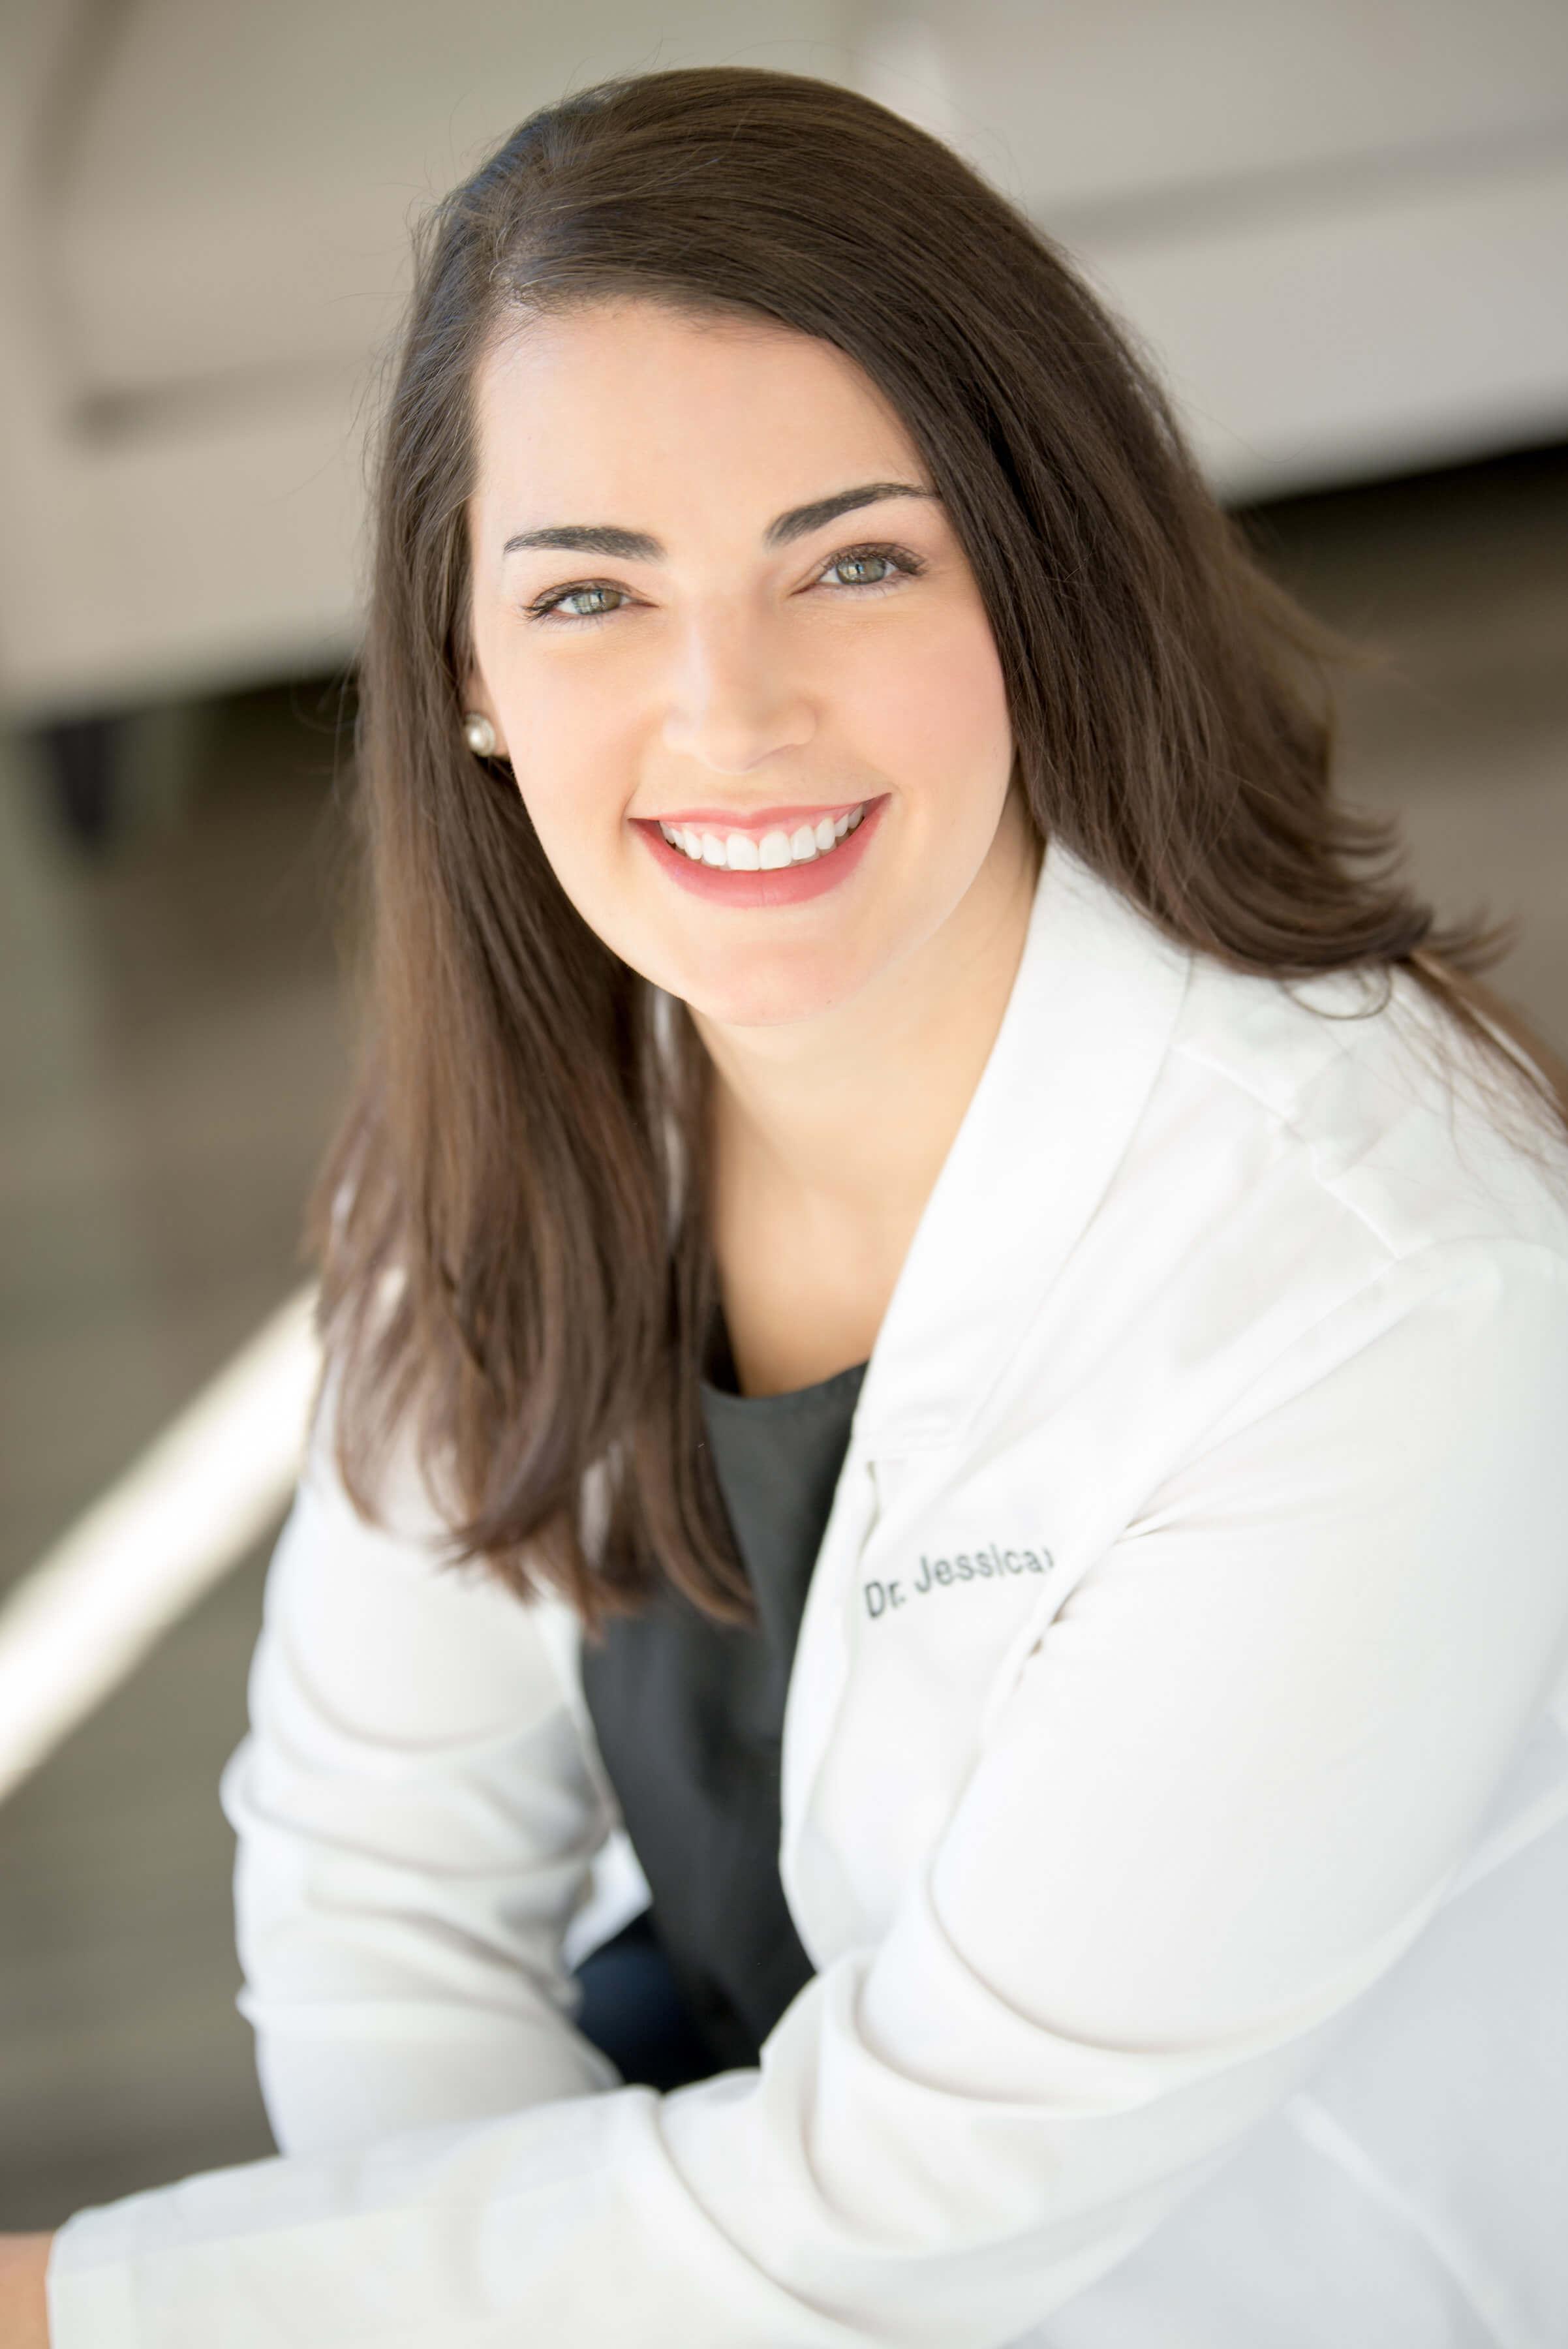 Dr. Jessica R. Kirk